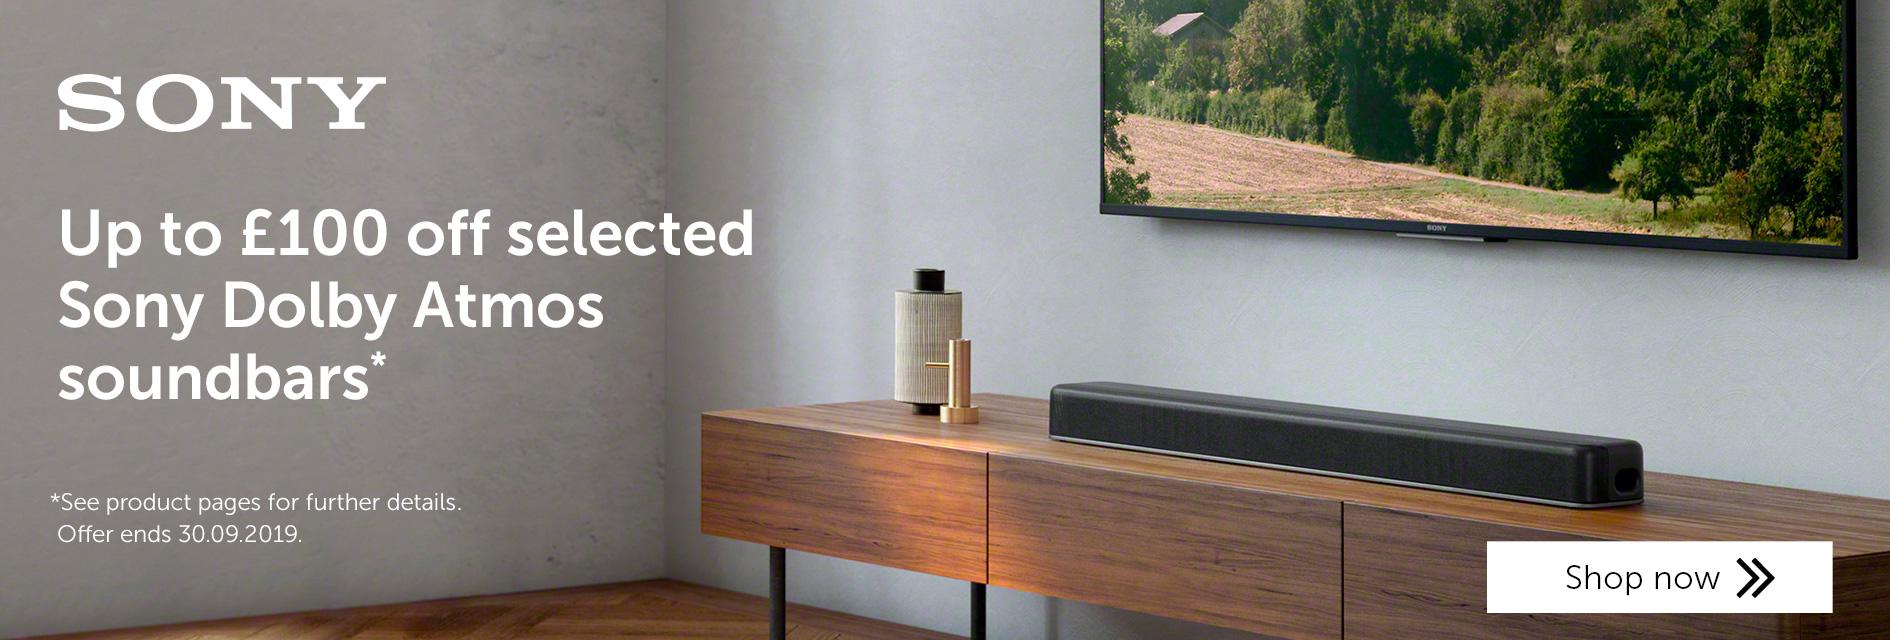 Sony Dolby Atmos soundbar promo